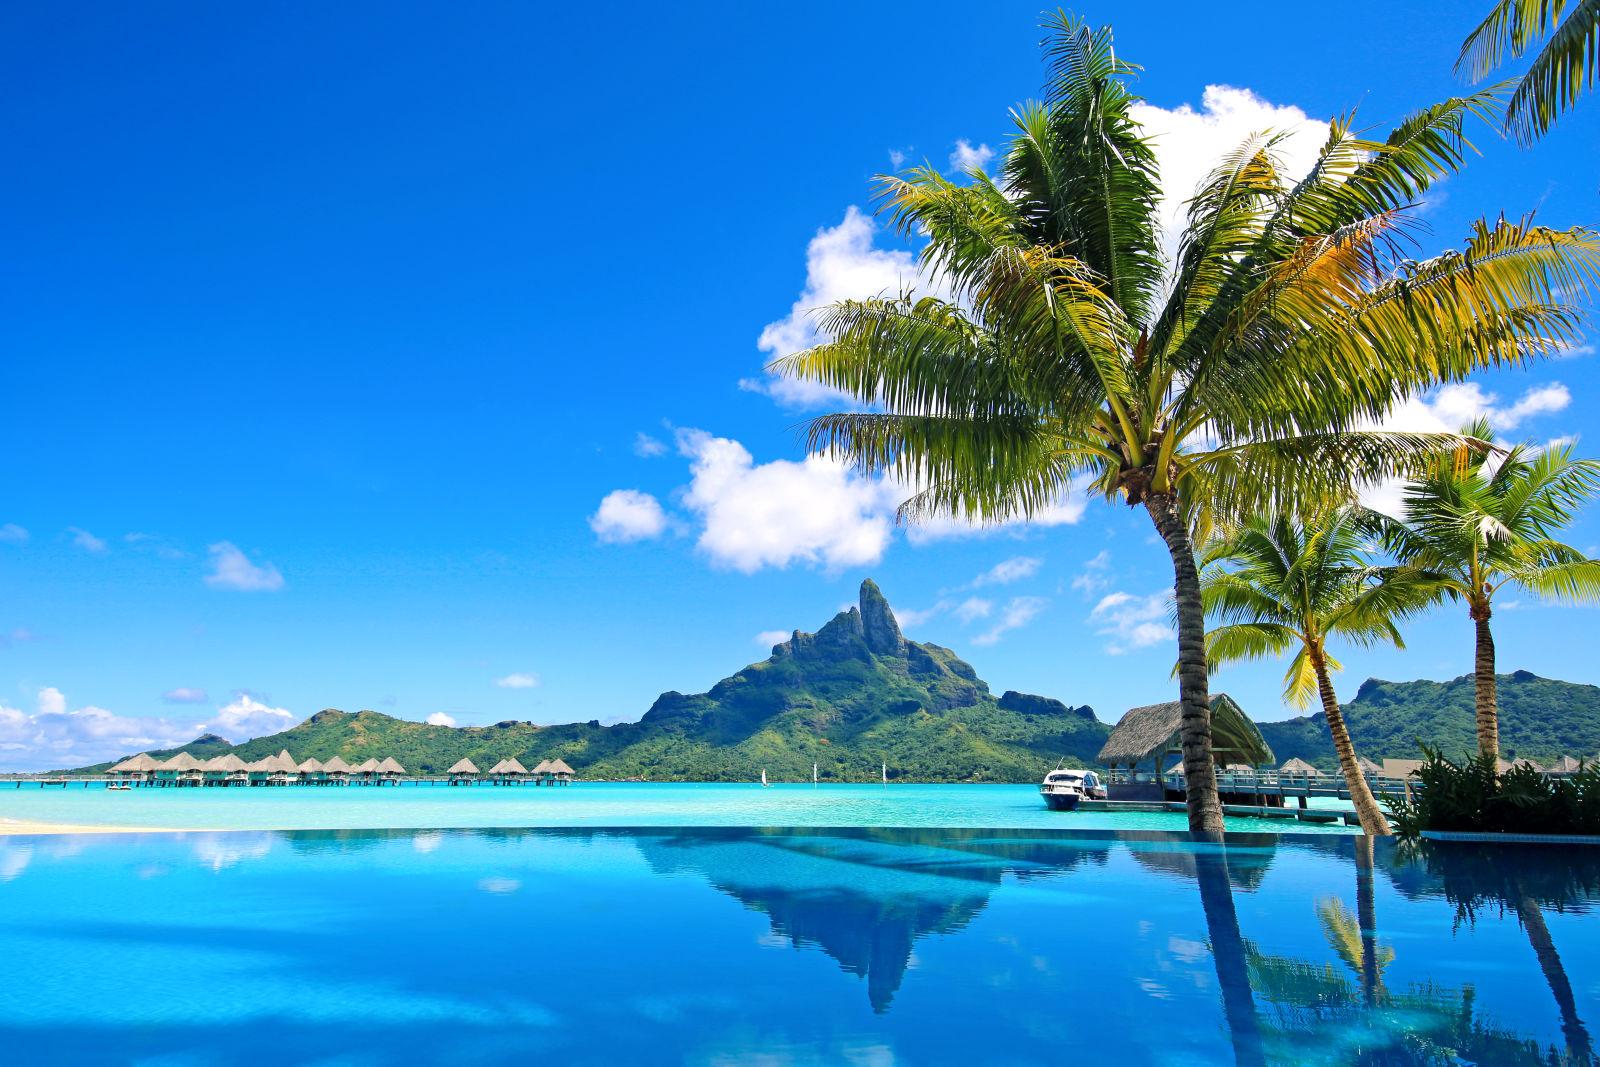 Bora Bora, French Polynesia, Leeward Islands